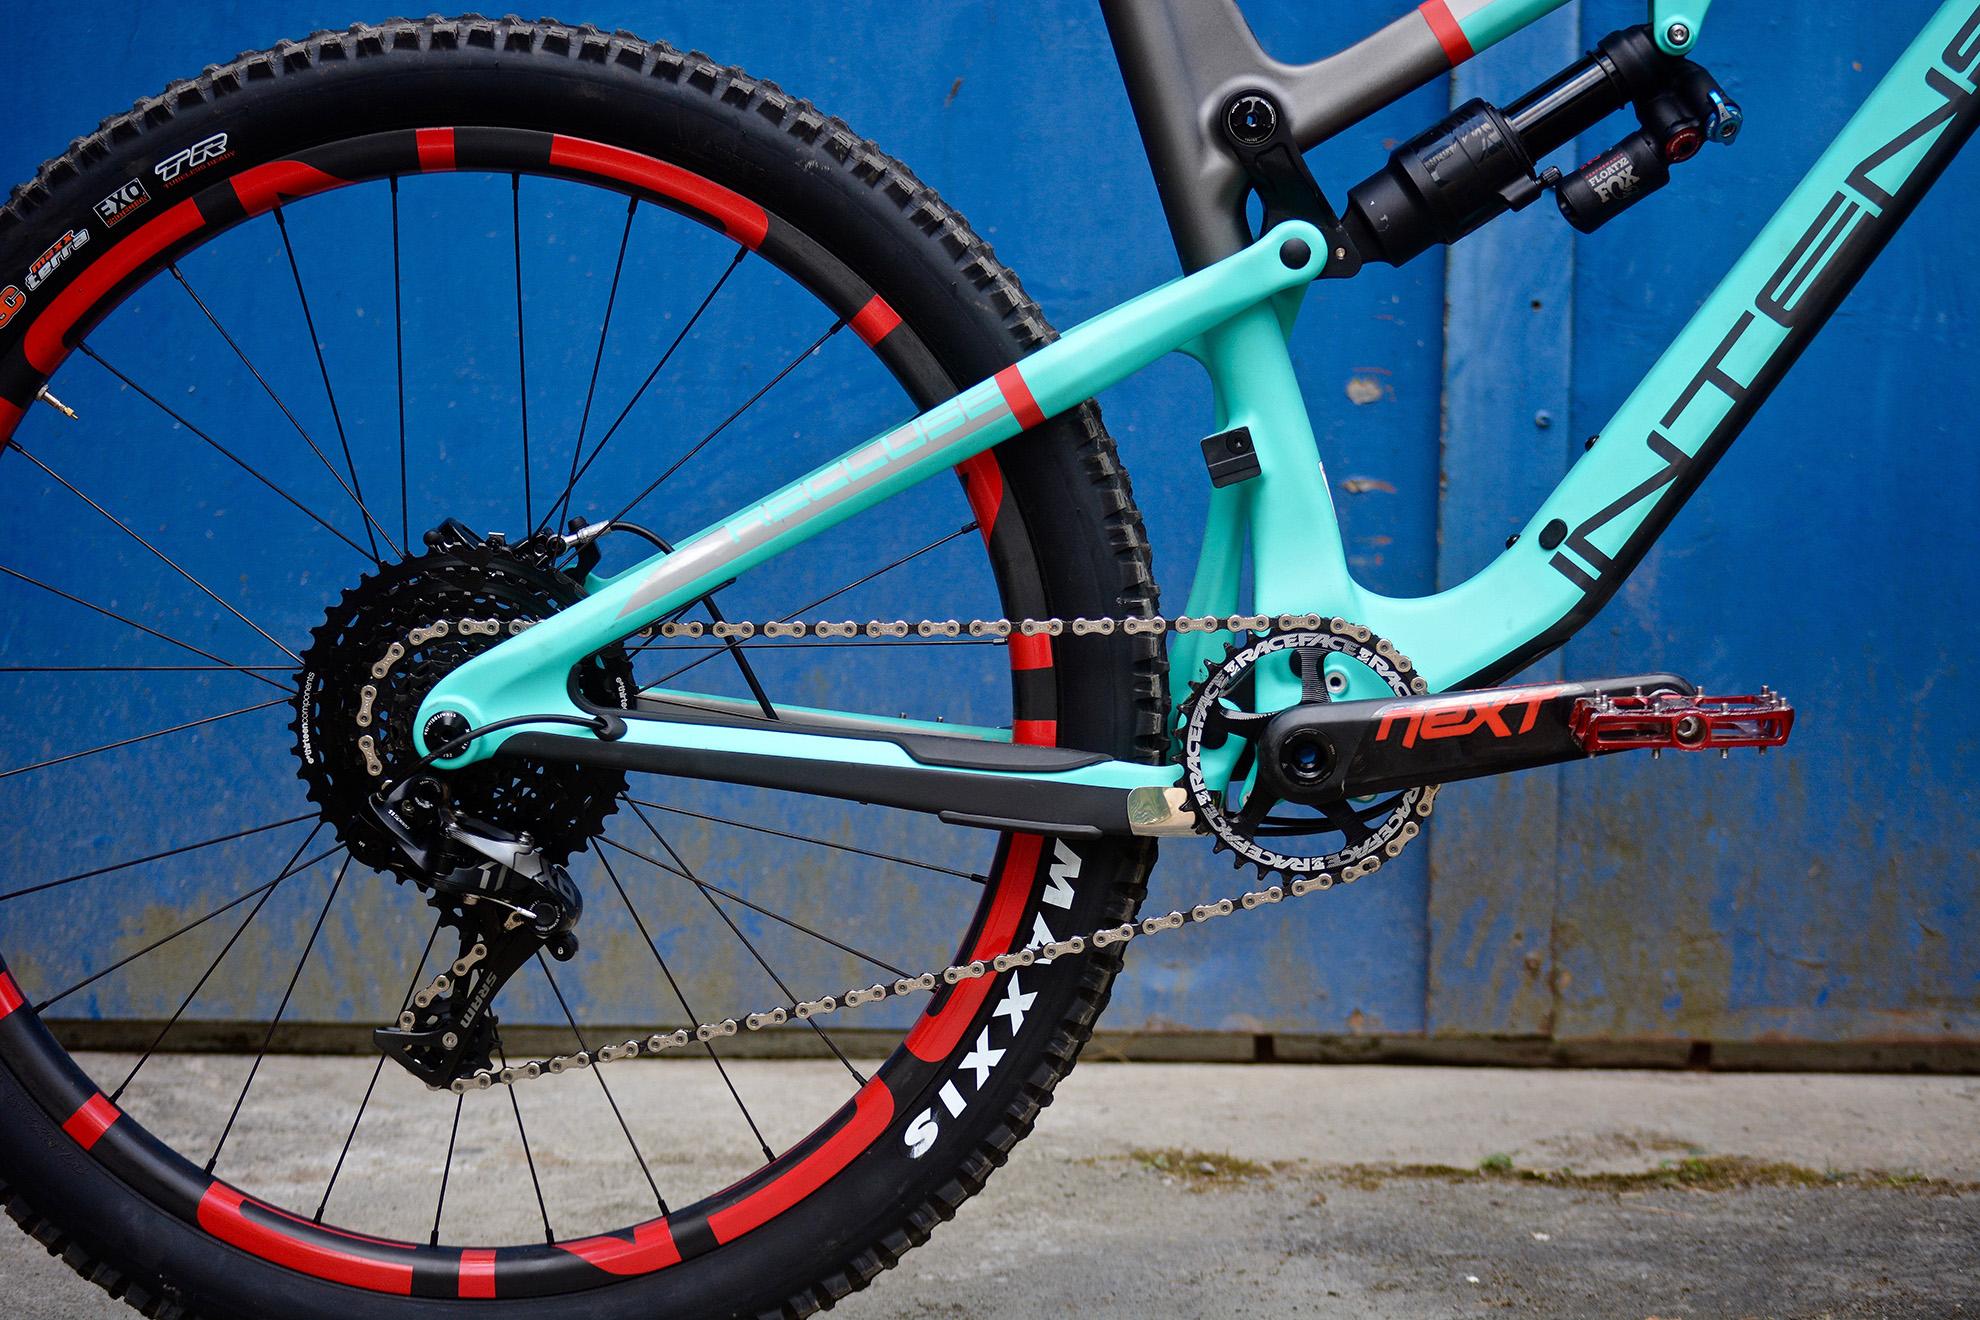 2017 Intense Recluse Dirt Intense bikes with free carbon wheels! dirt mountain bike magazine